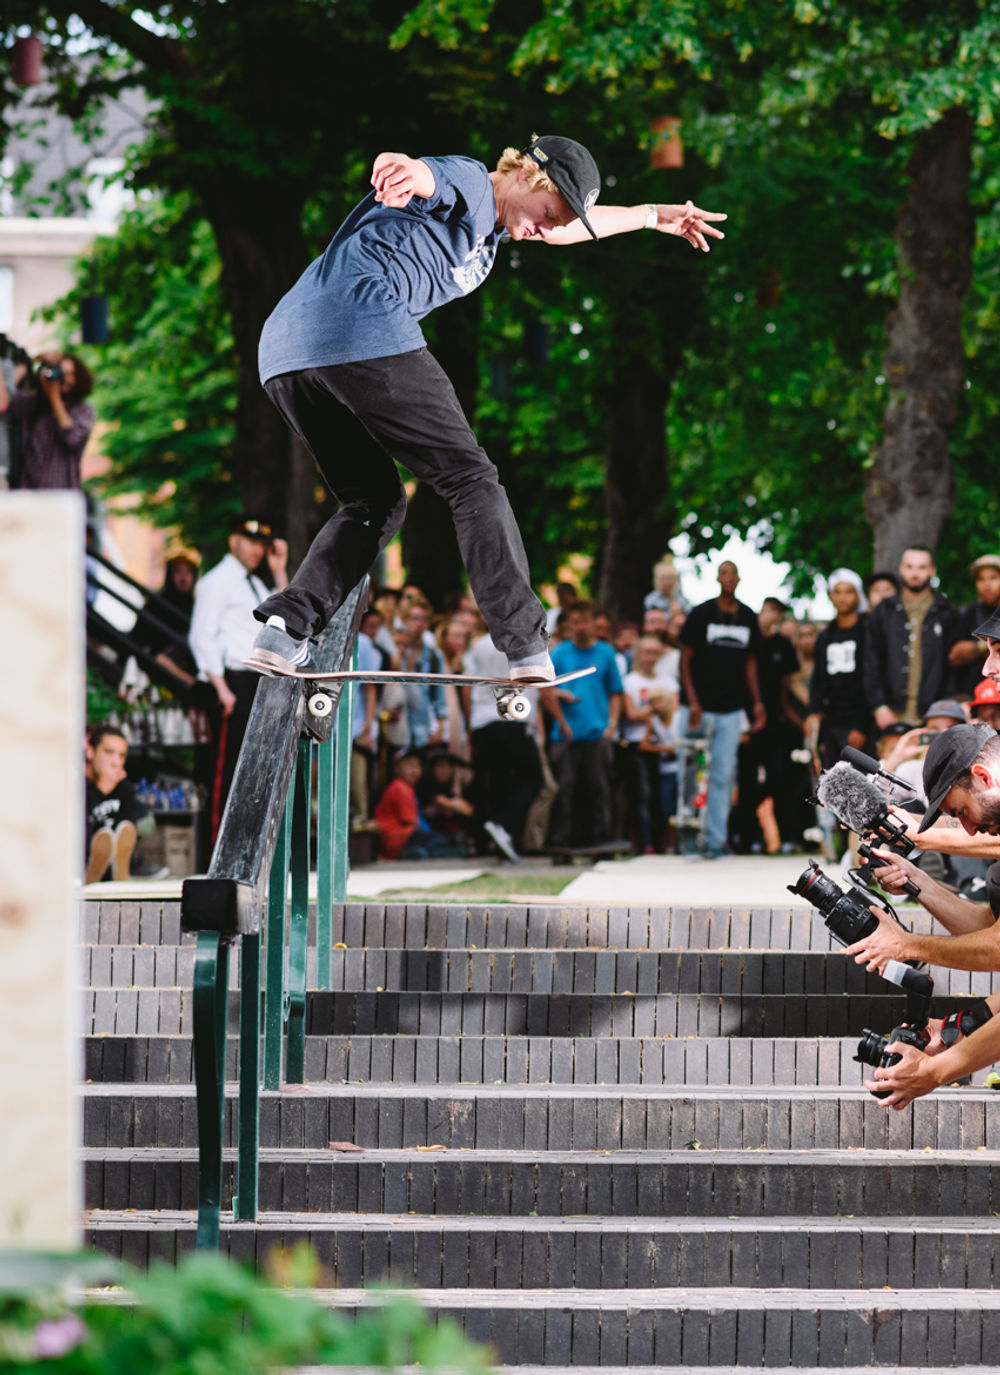 _IHC5475e-Alec-Majerus-Bs-Tailslide-Nike-SB-Copenhagen-Open-Day-4-July-2015-Photographer-Maksim-Kalanep